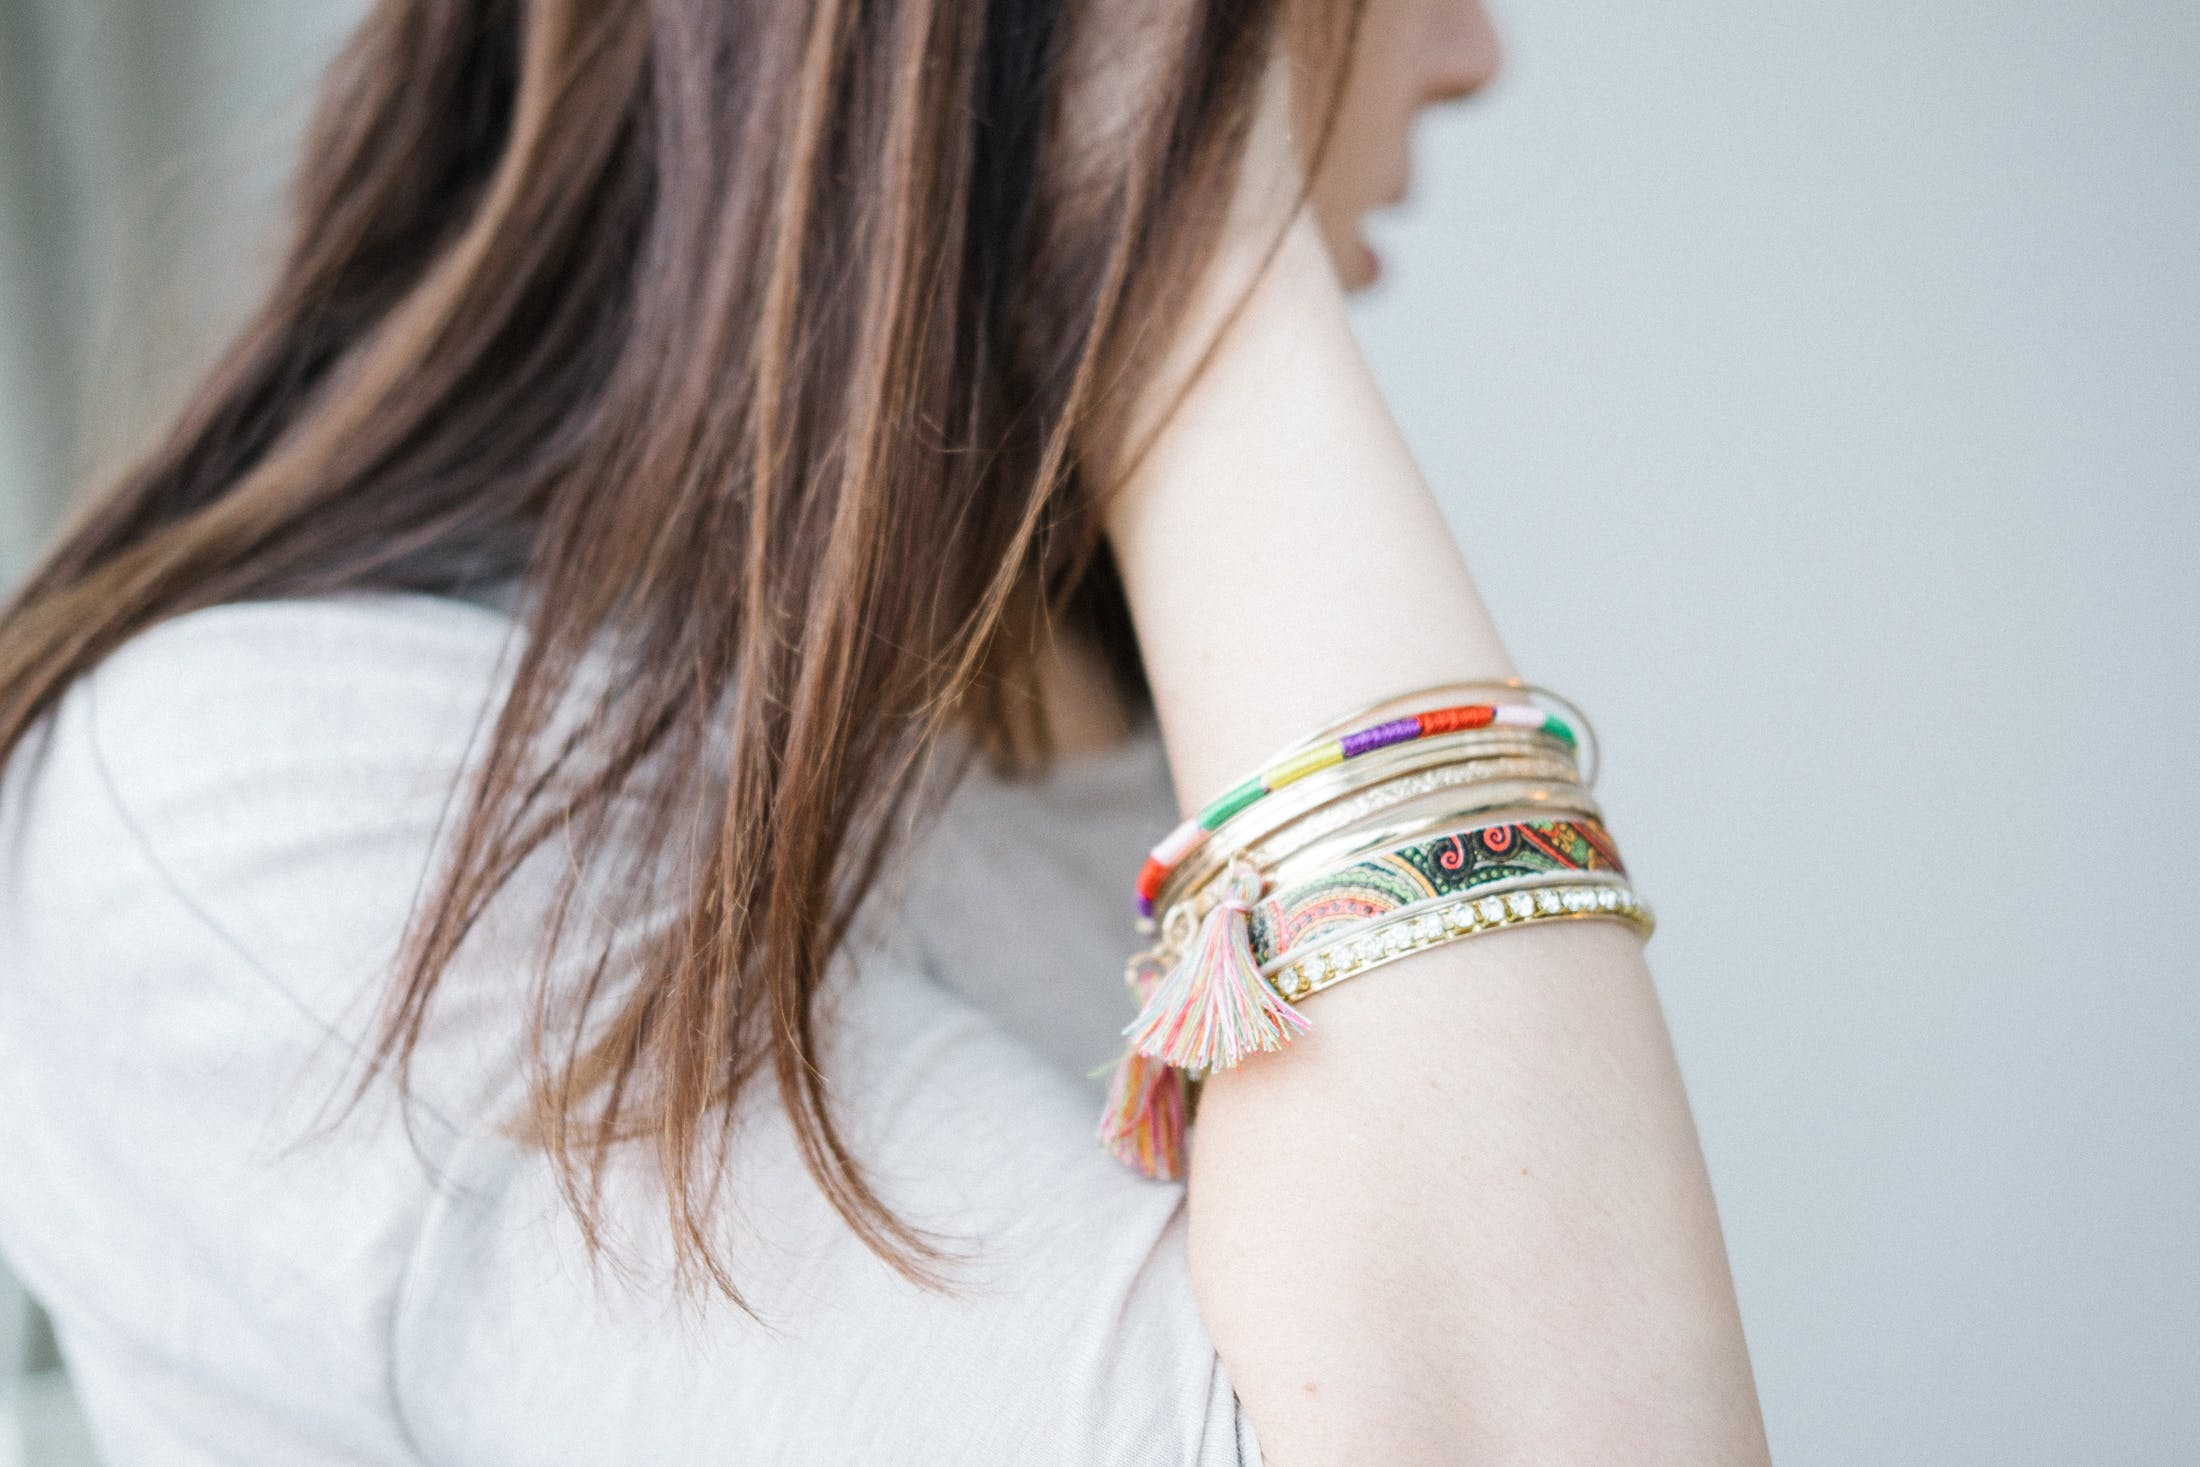 Kostenloses Stock Foto zu armband, fashion, frau, haar